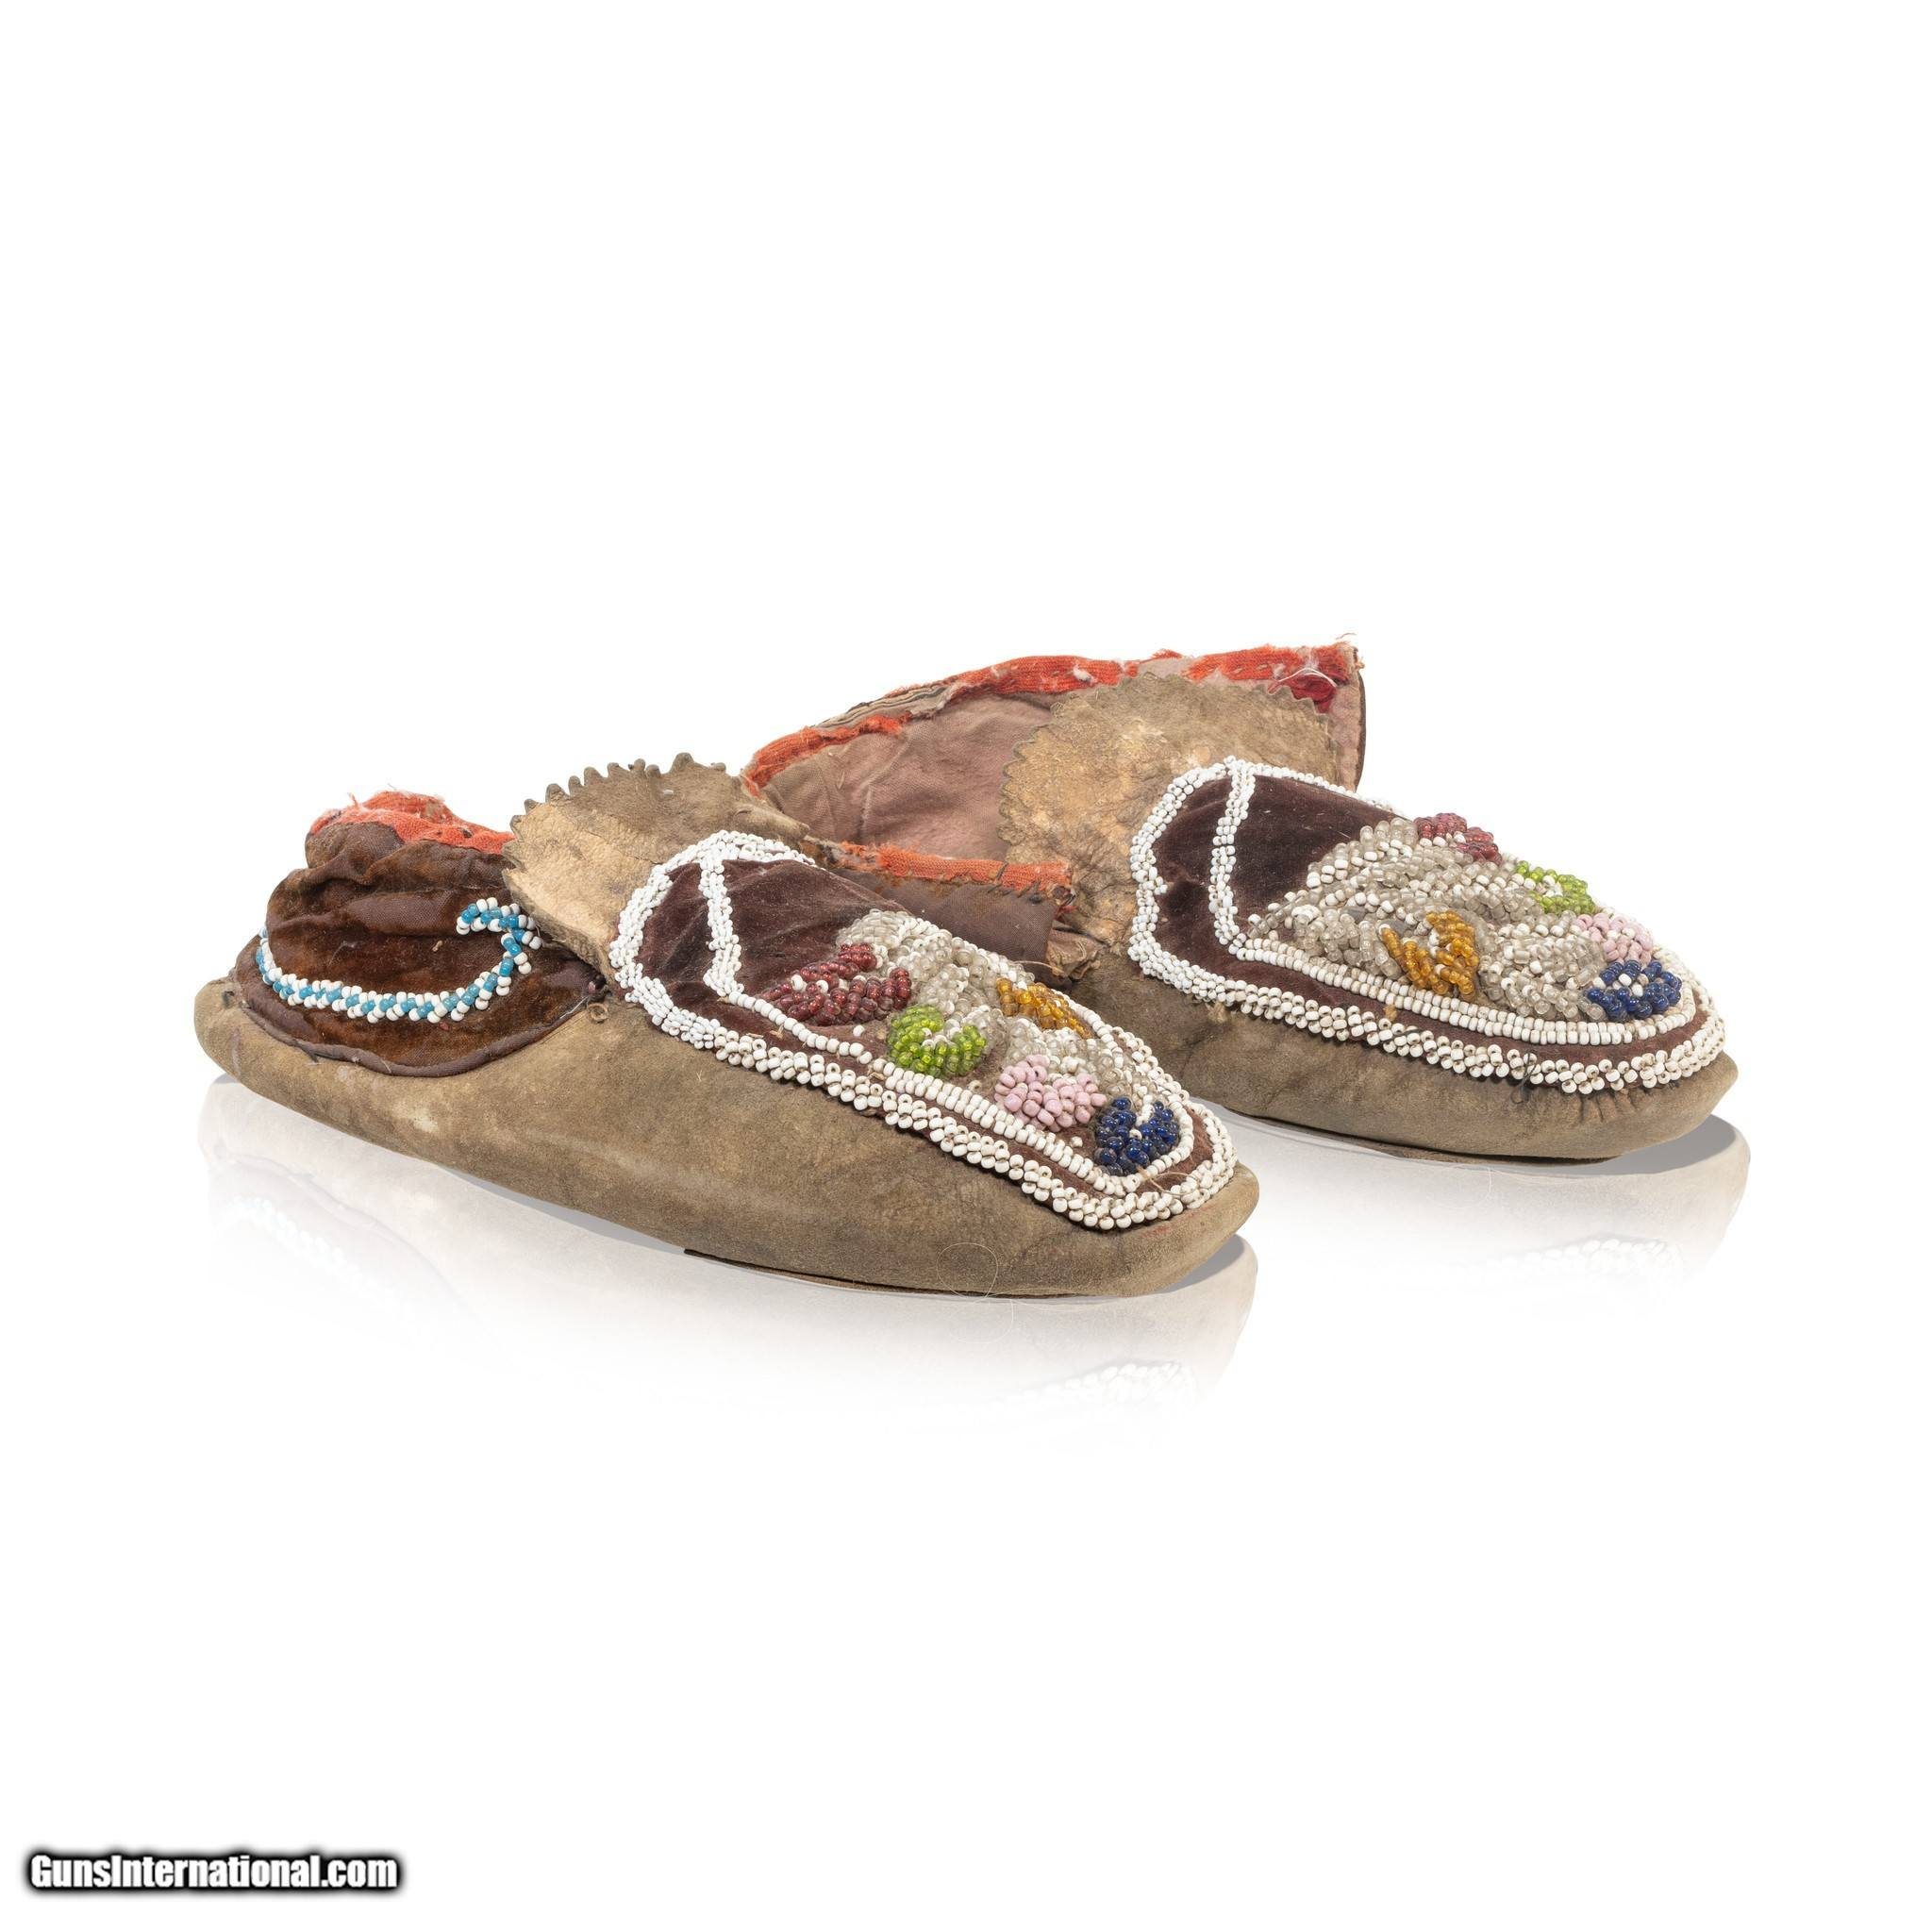 Ojibwa Moccasins for sale